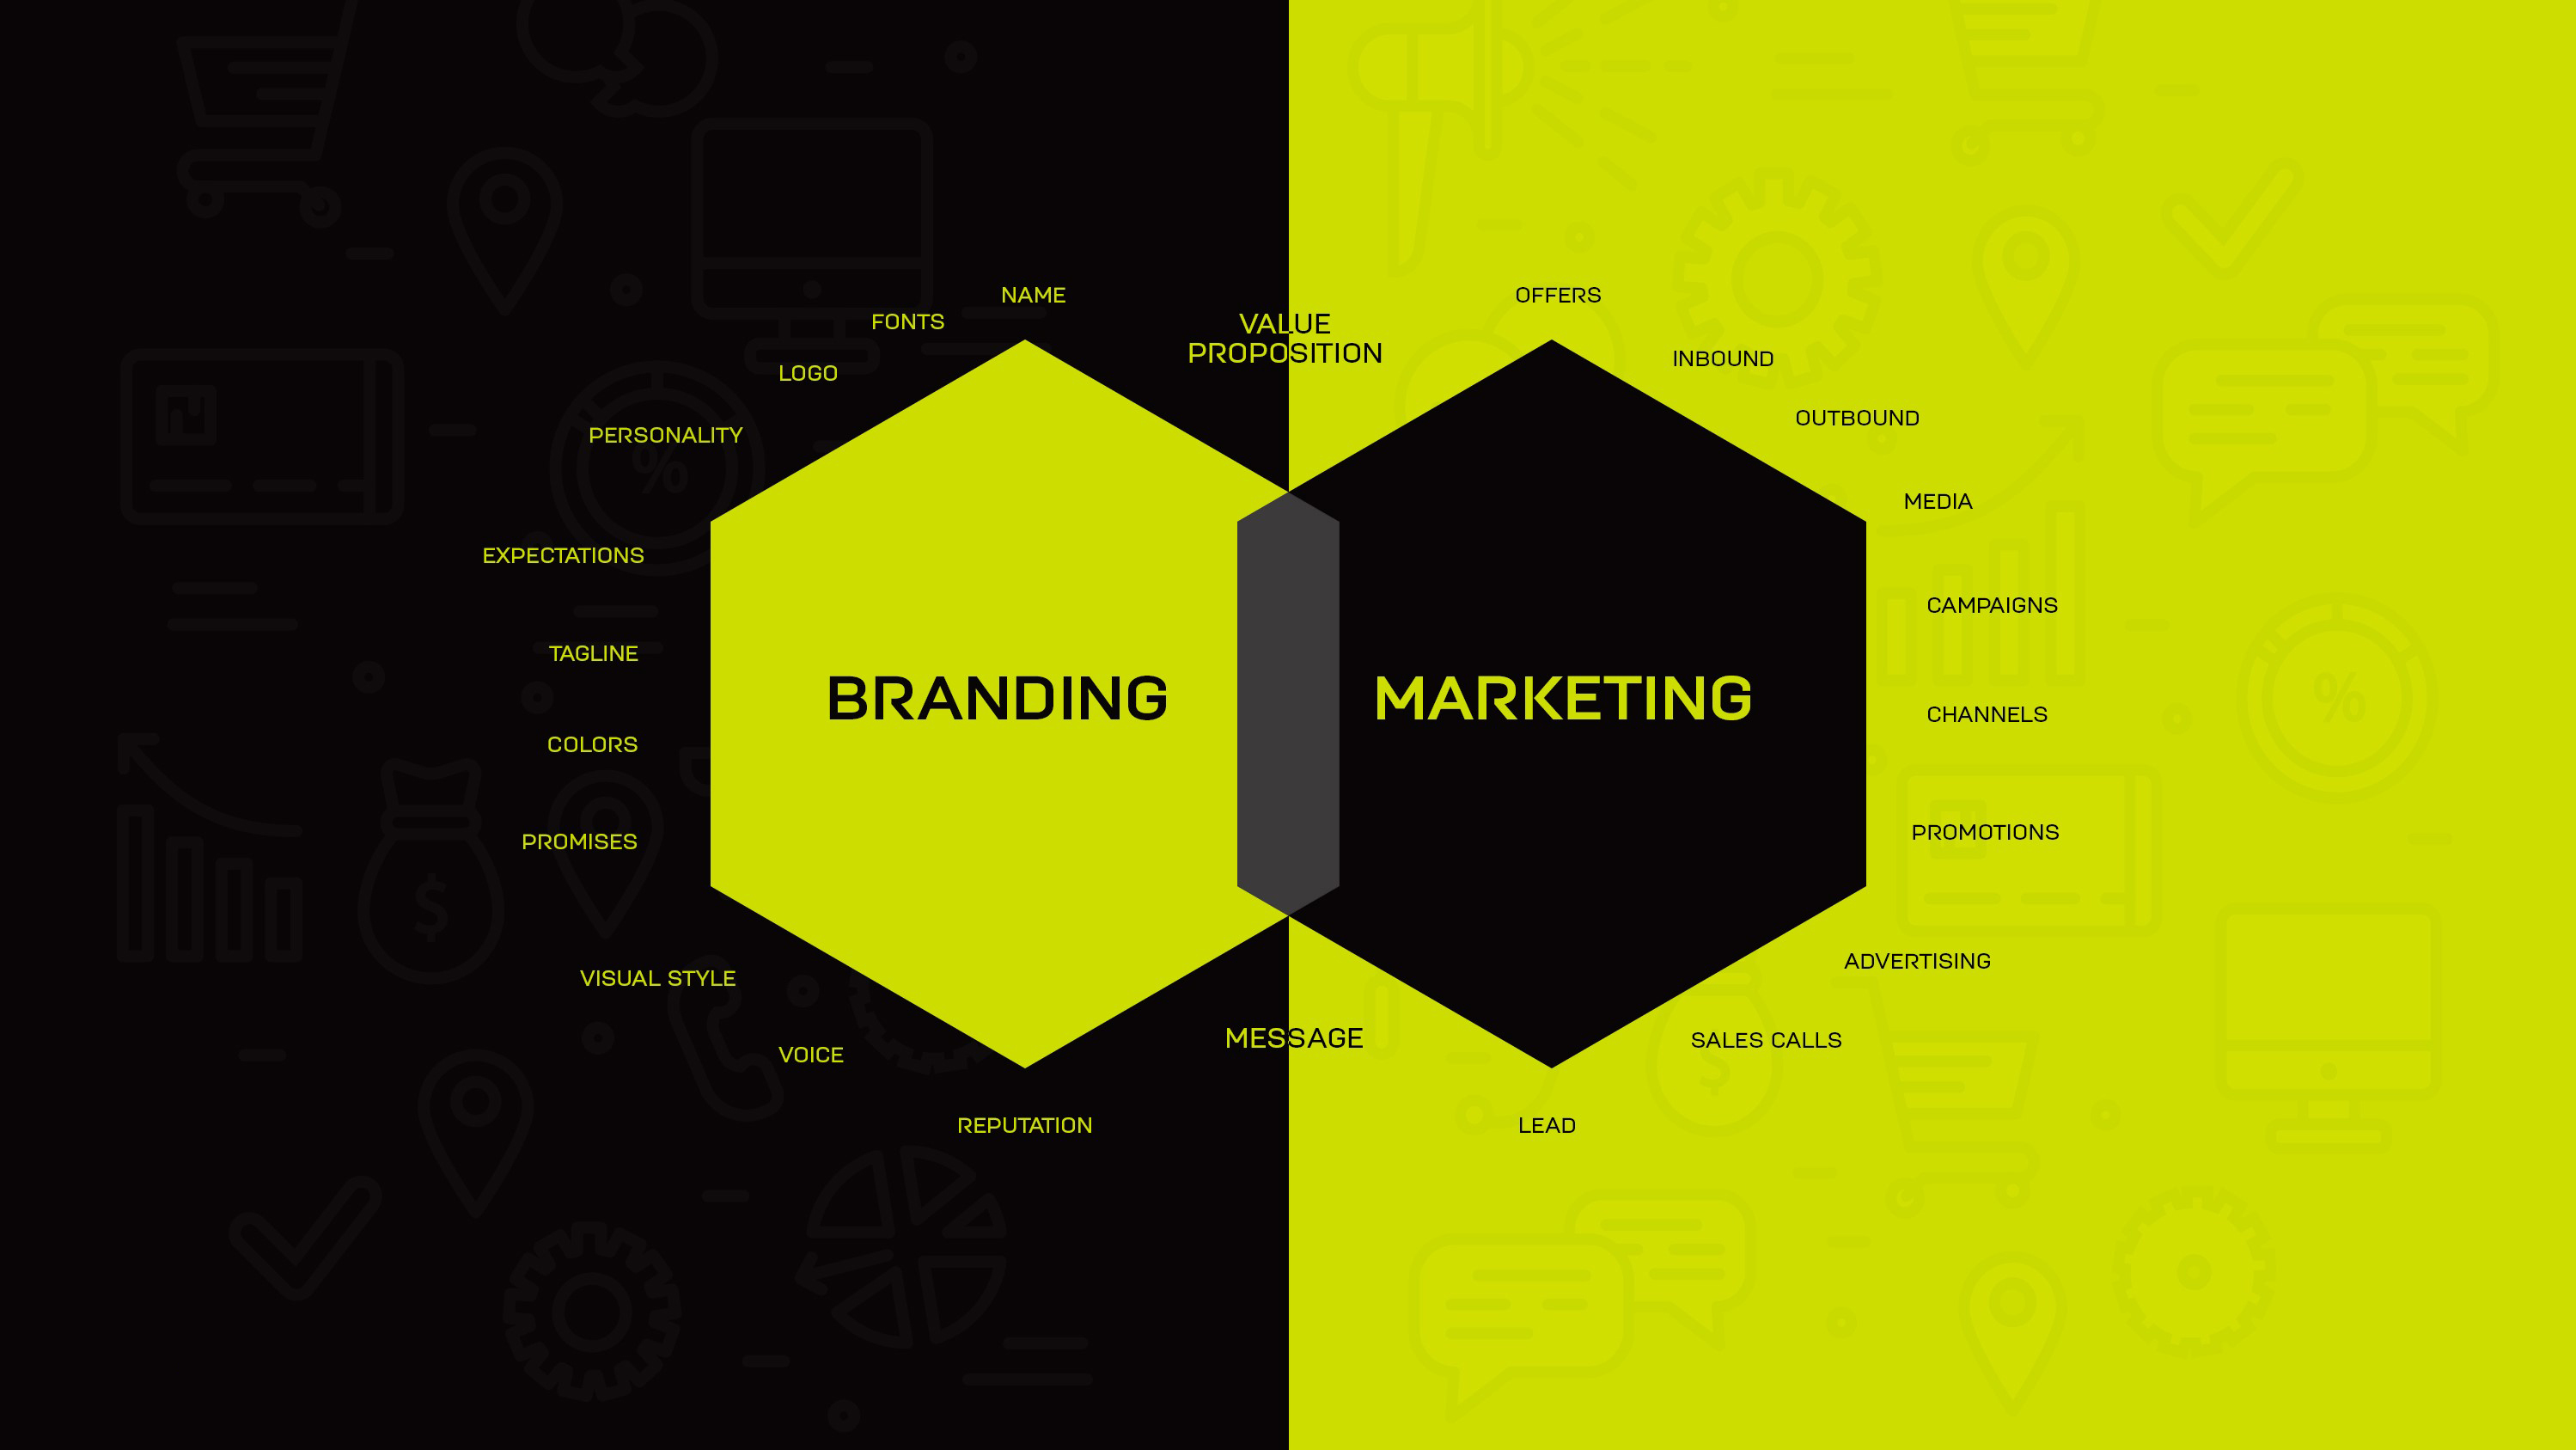 Branding versus marketing